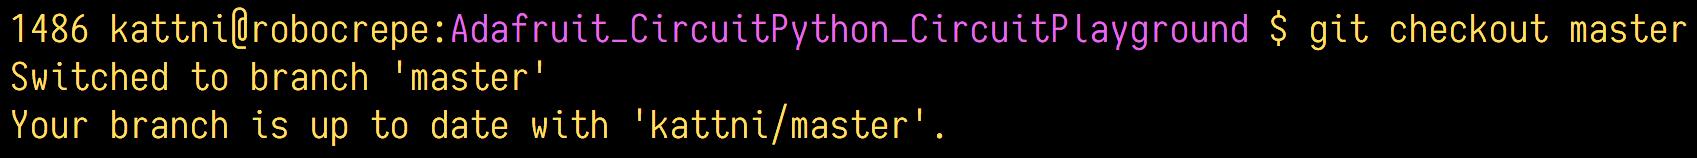 circuitpython_GitUpdateCheckoutMaster.png